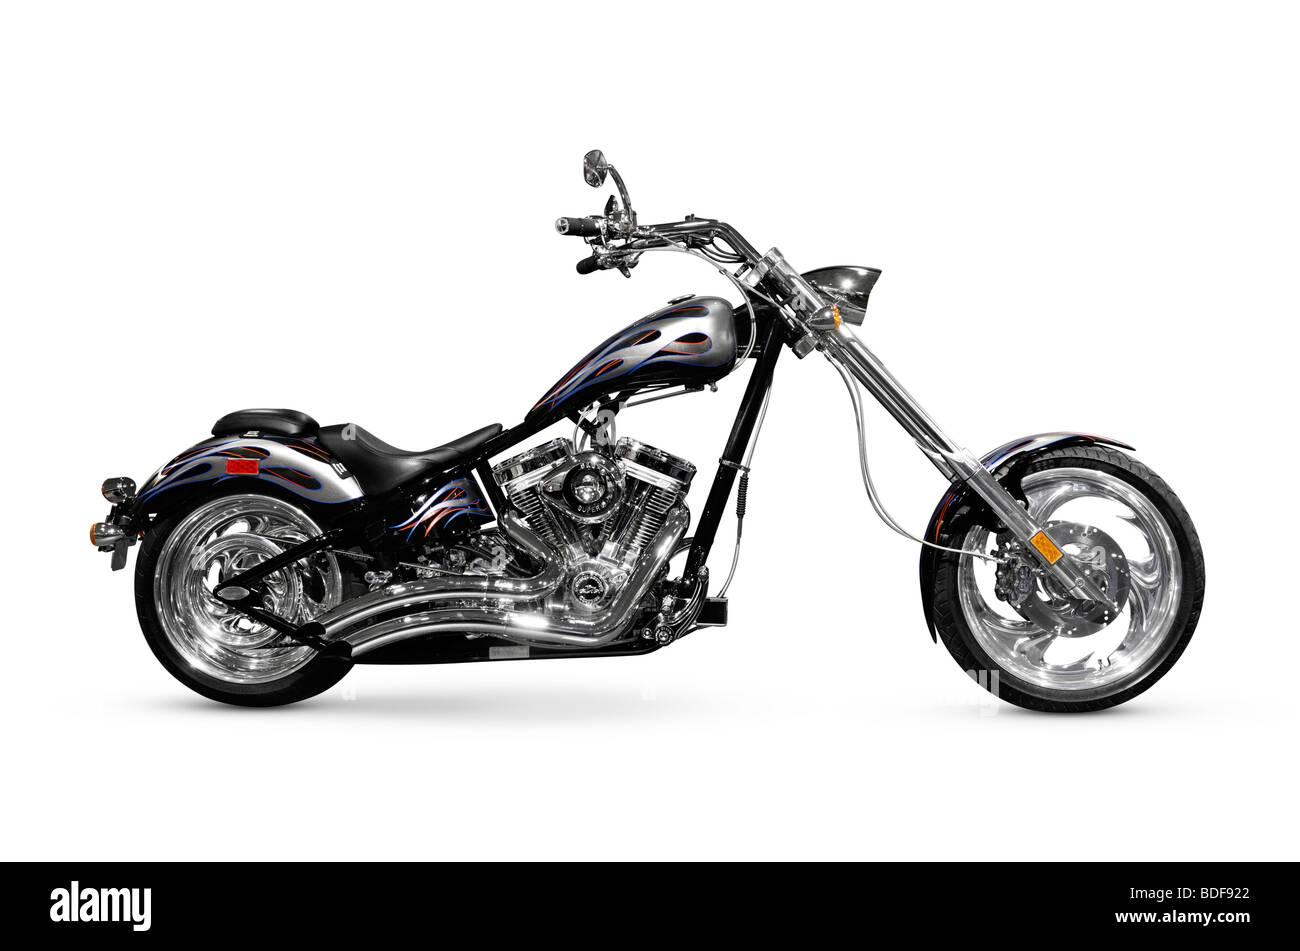 Shiny black with chrome chopper. Customized motorcycle - Stock Image